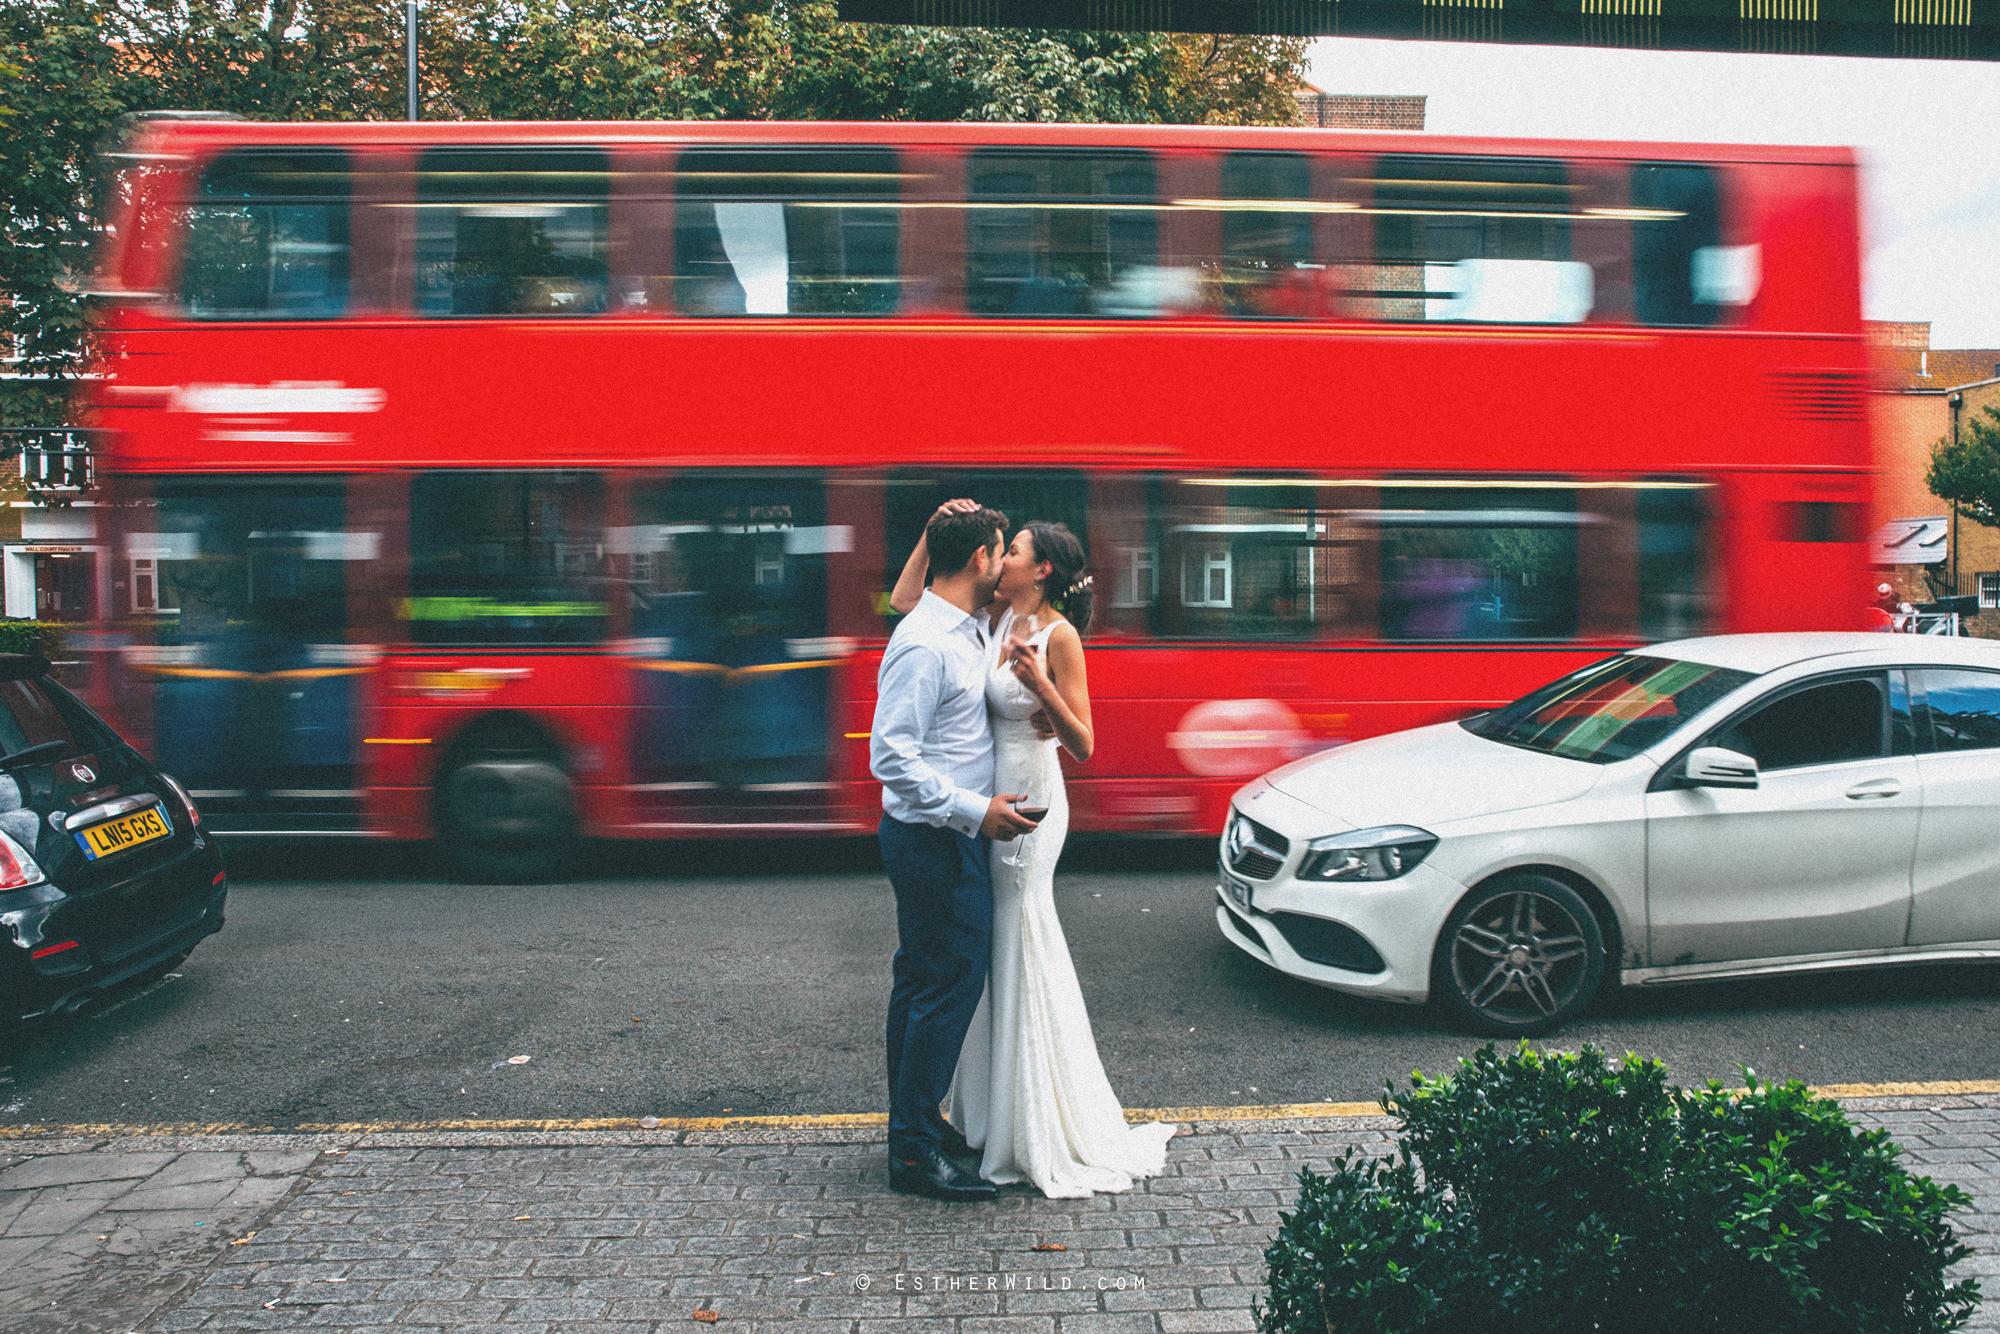 Islington_Town_Hall_Wedding_London_Photographer_Esther_Wild_IMG_6452-1.jpg